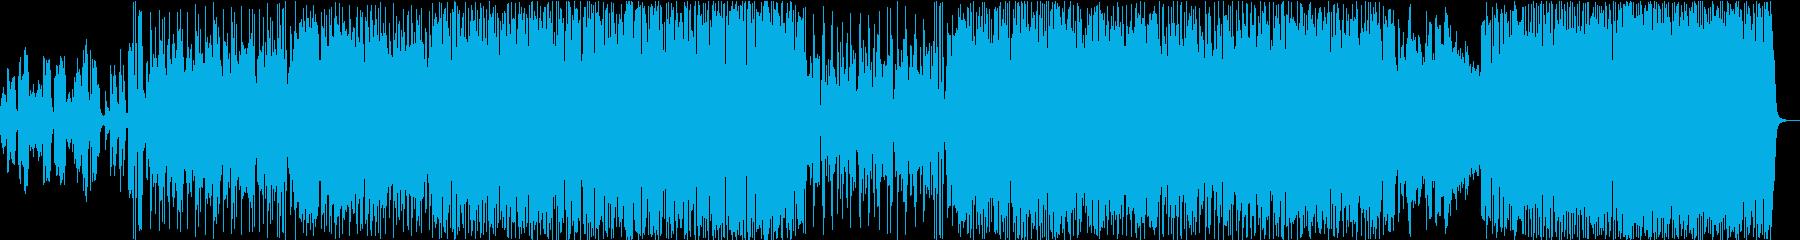 ONEMANの再生済みの波形